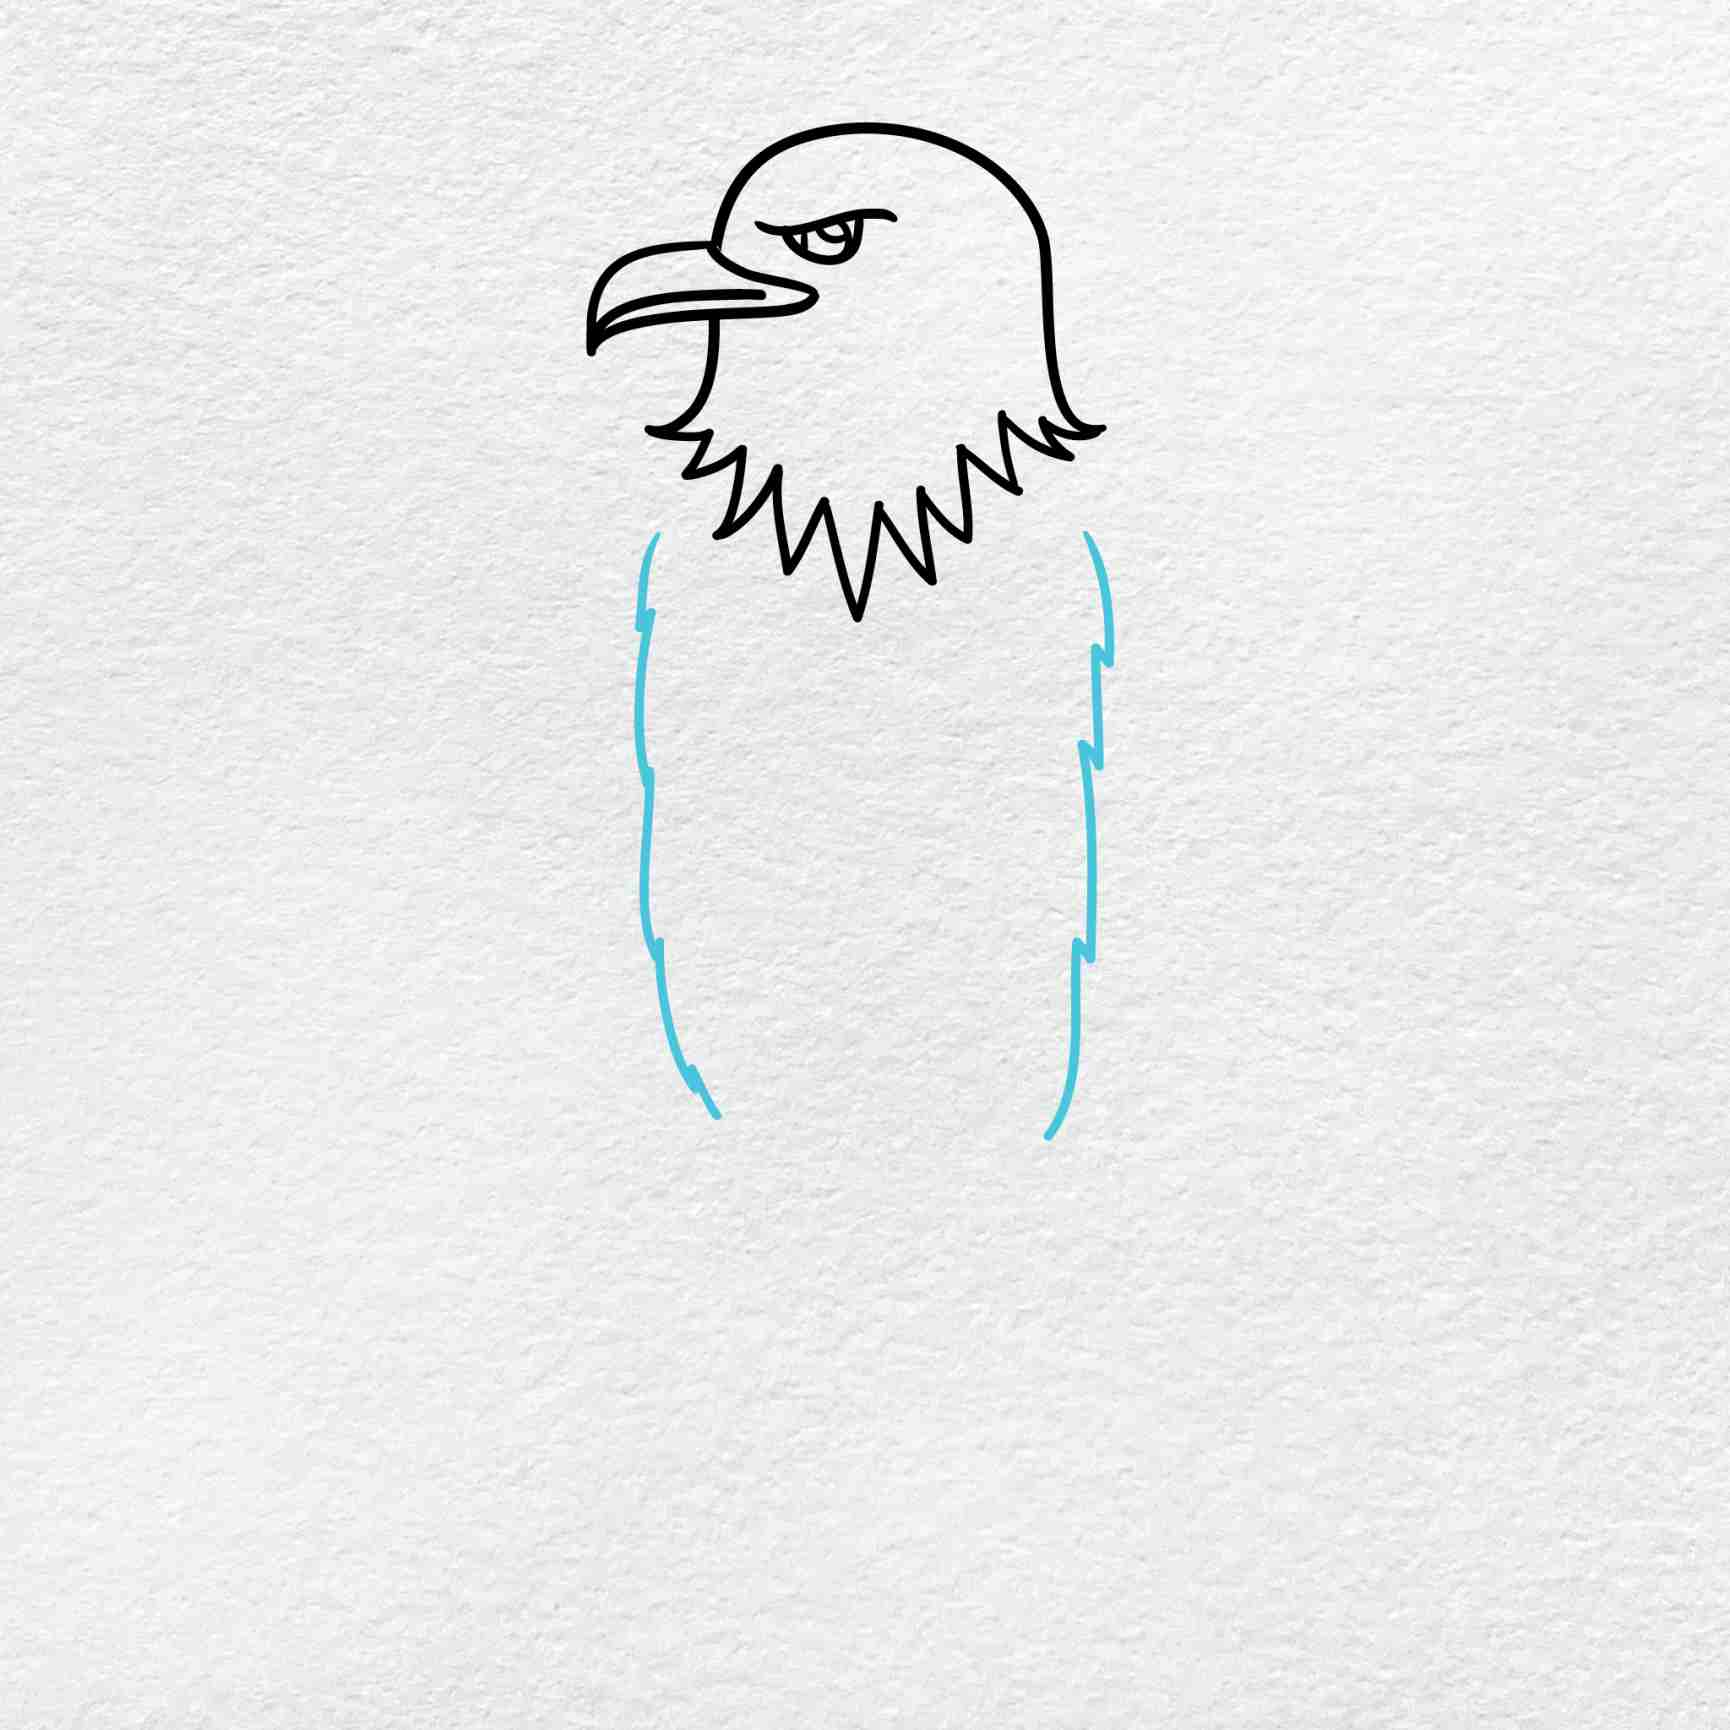 Bald Eagle Drawing: Step 3